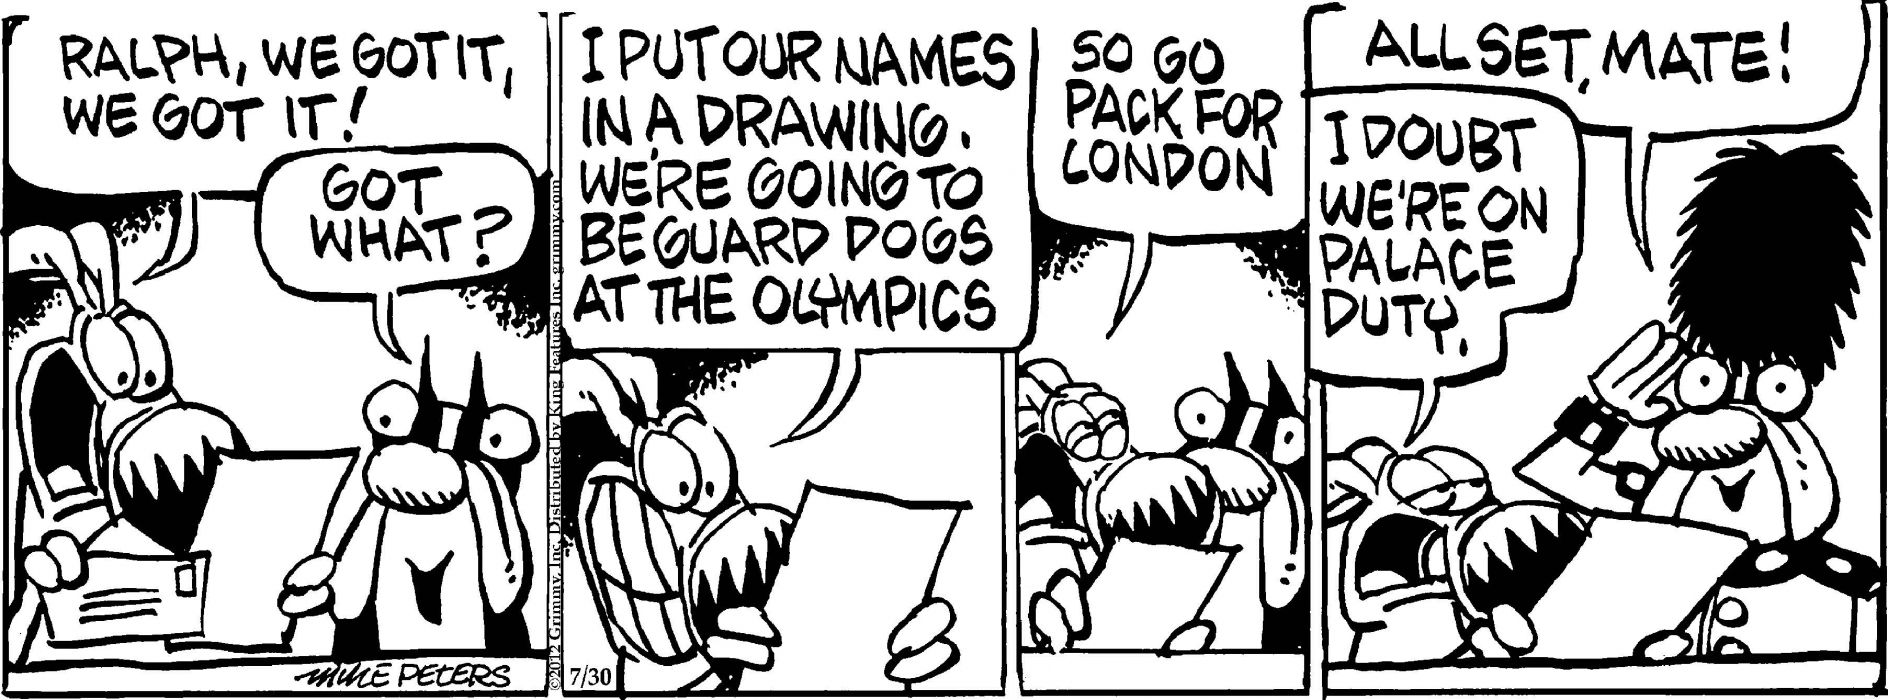 MOTHER-GOOSE-AND-GRIM mother goose grim funny humor comicstrip (10) wallpaper